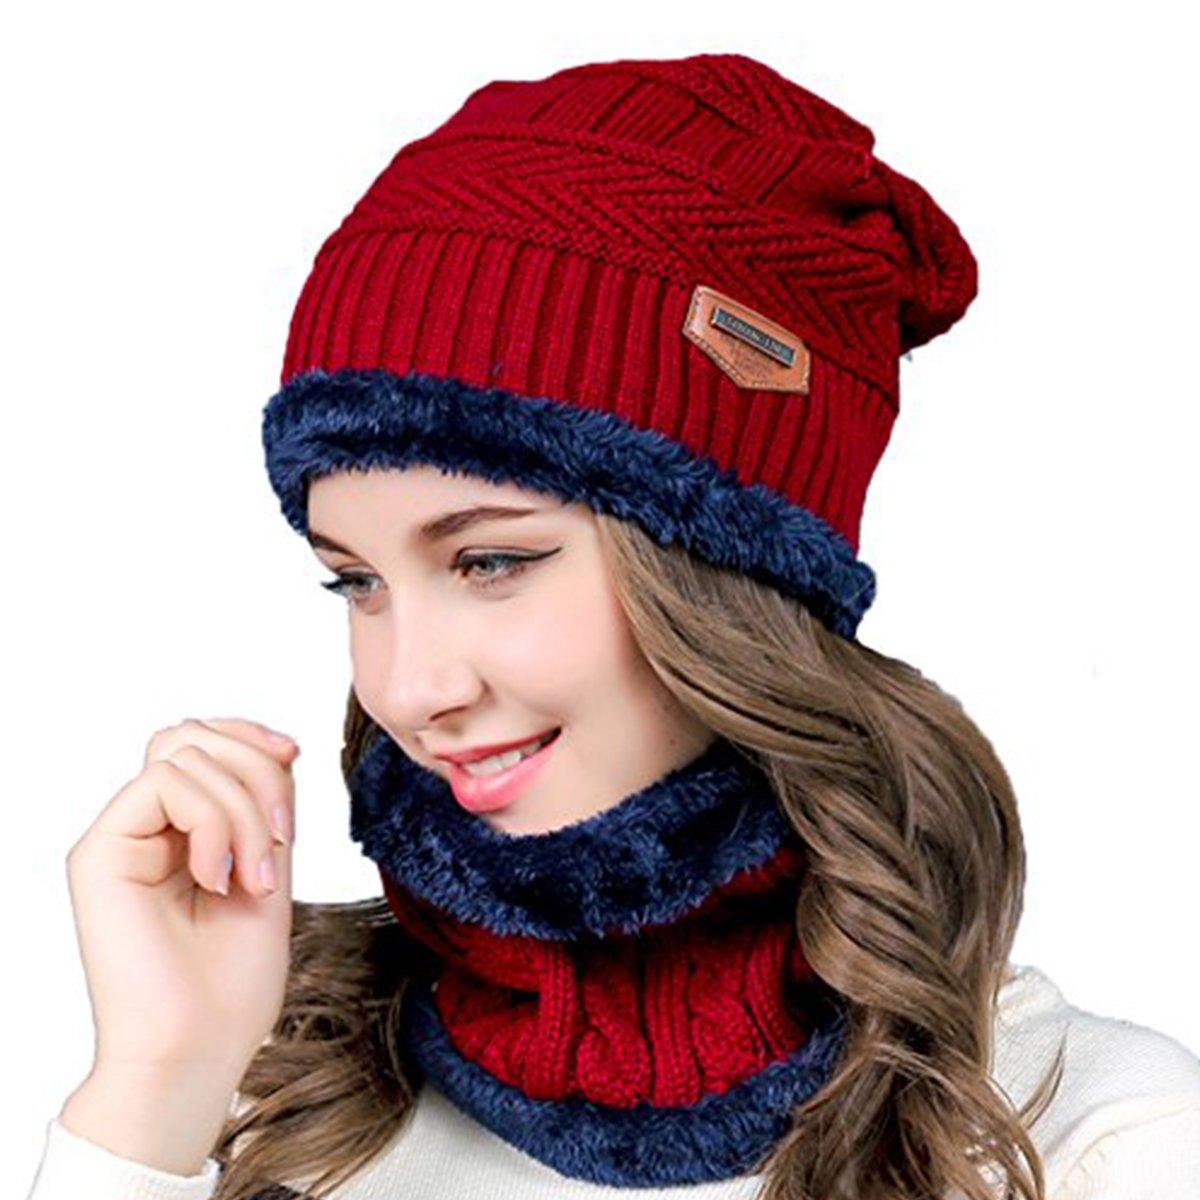 Loistu 2-in-1 Winter Beanie Hat Scarf Set,Warm Knitted Hat with Fleece Liner, Outdoor Sports Skull Cap for Men & Women